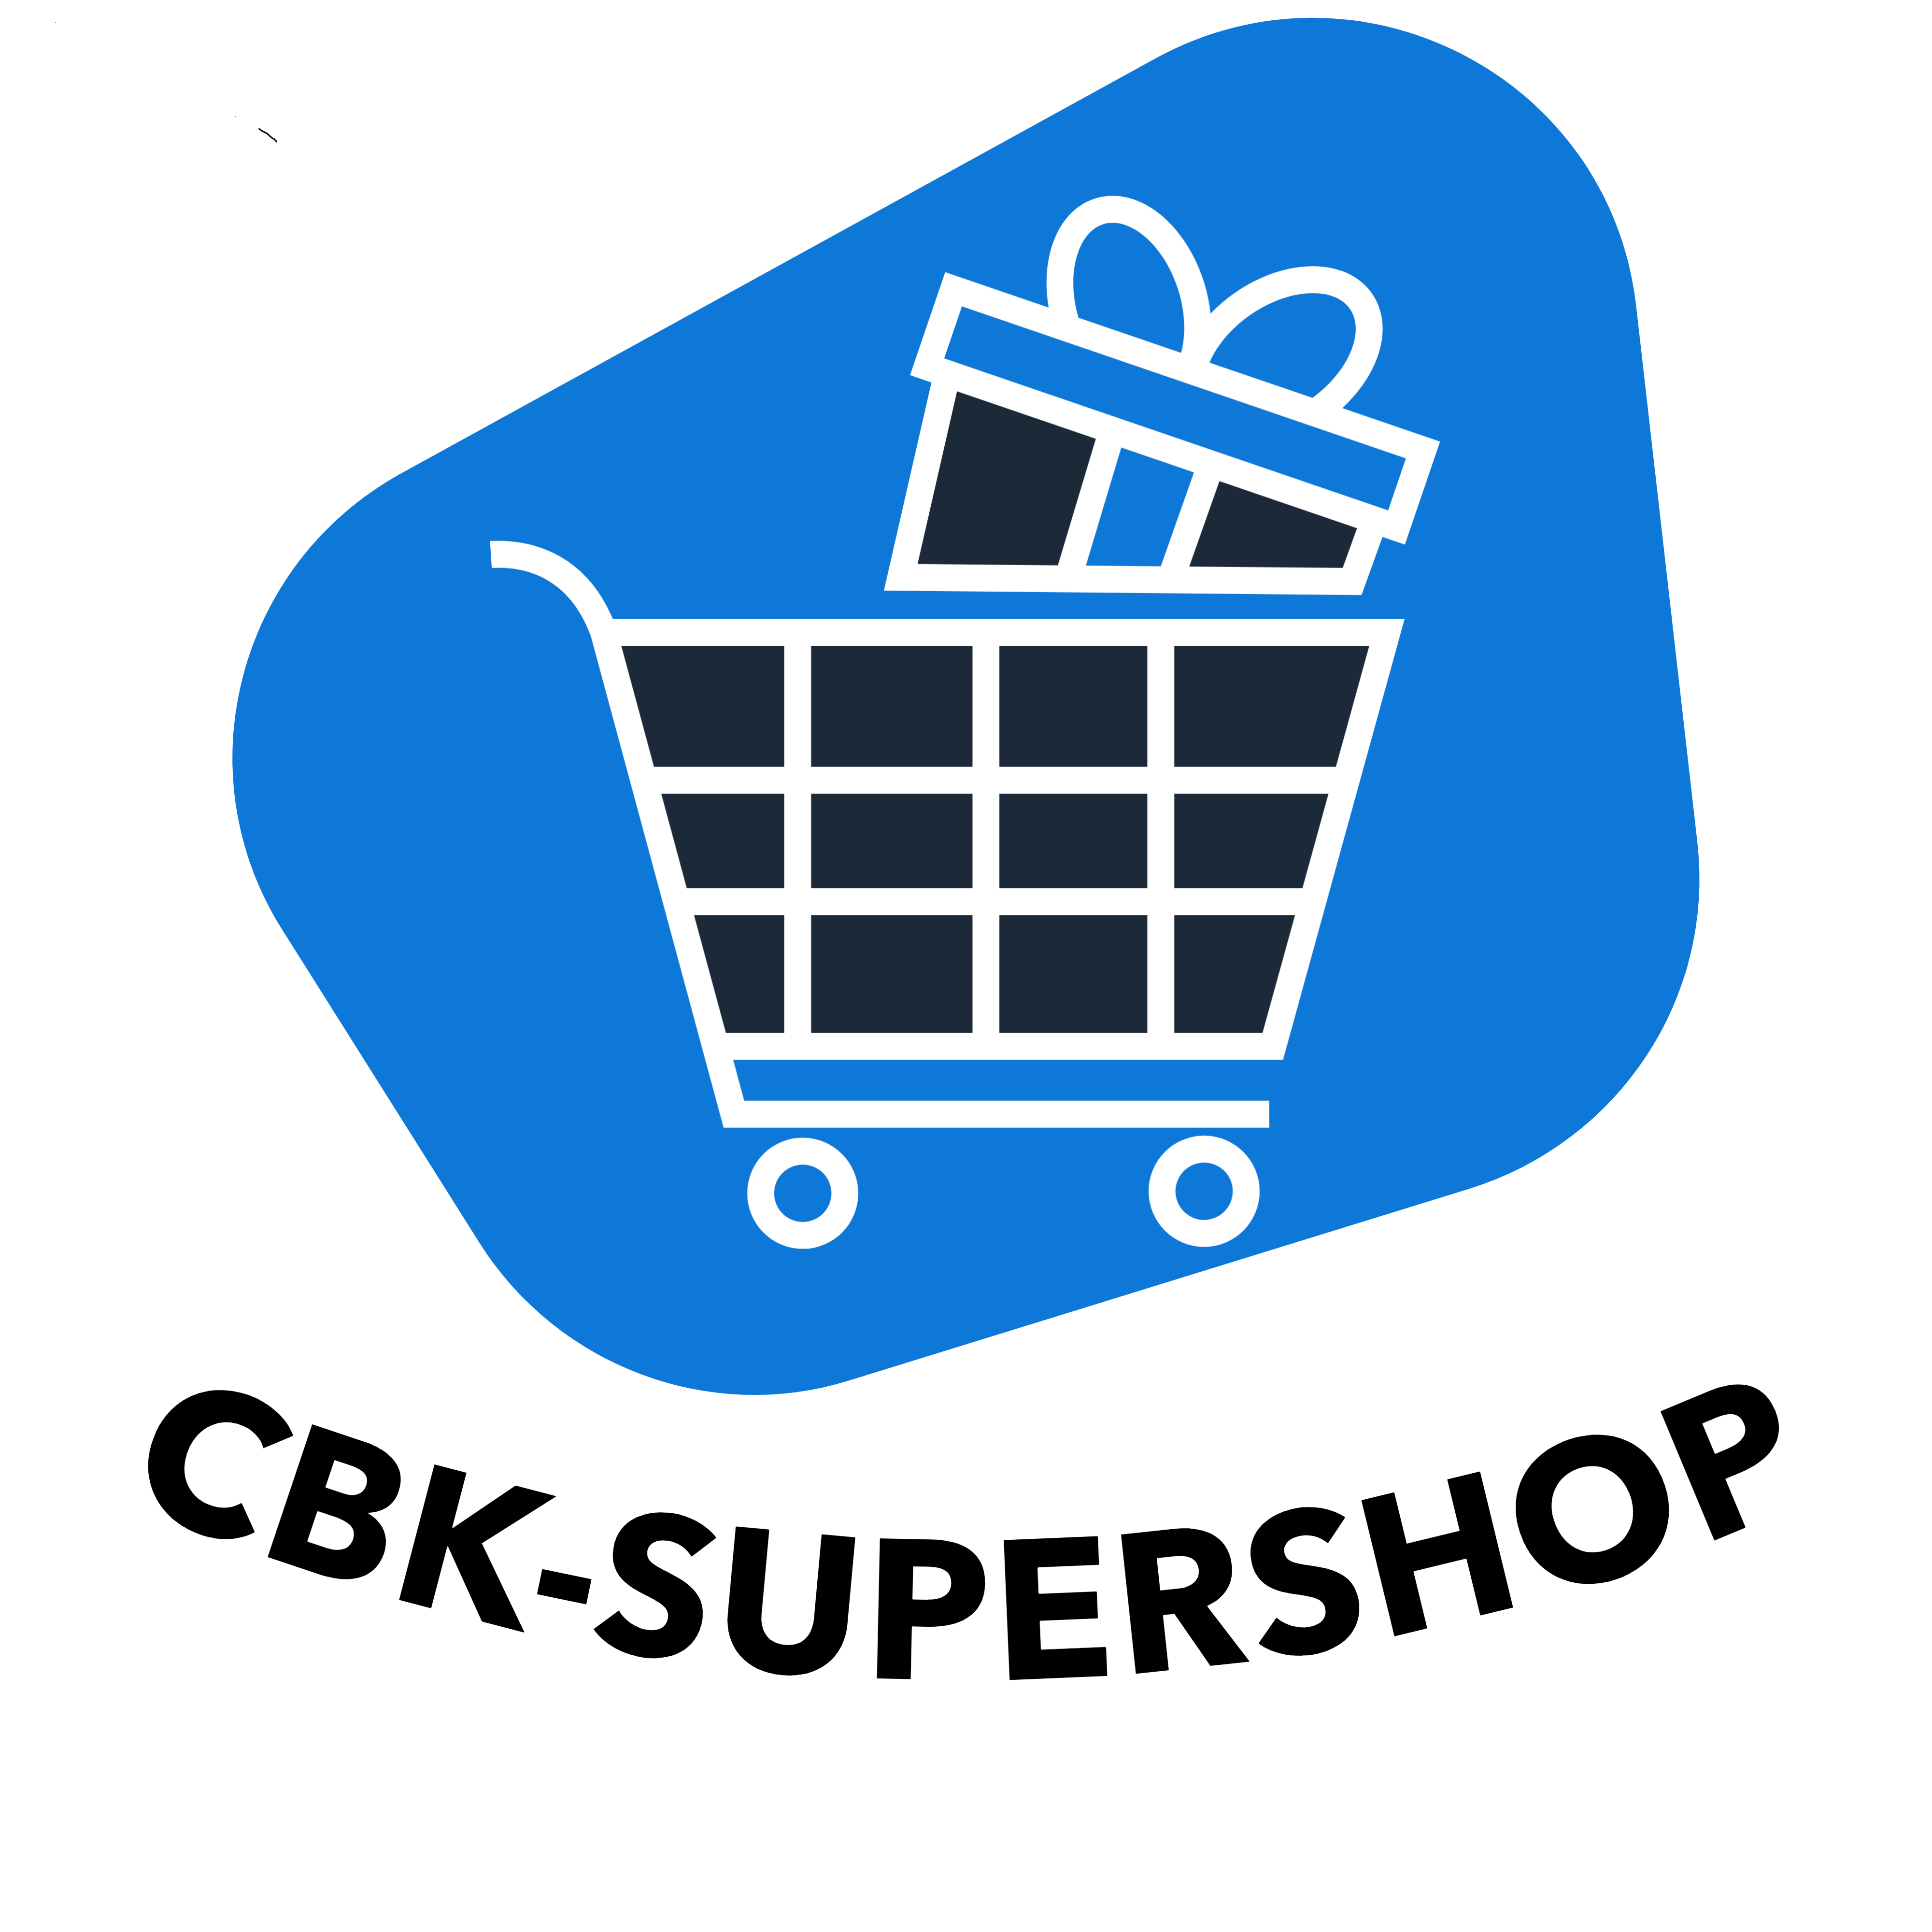 CBK SUPERSHOP